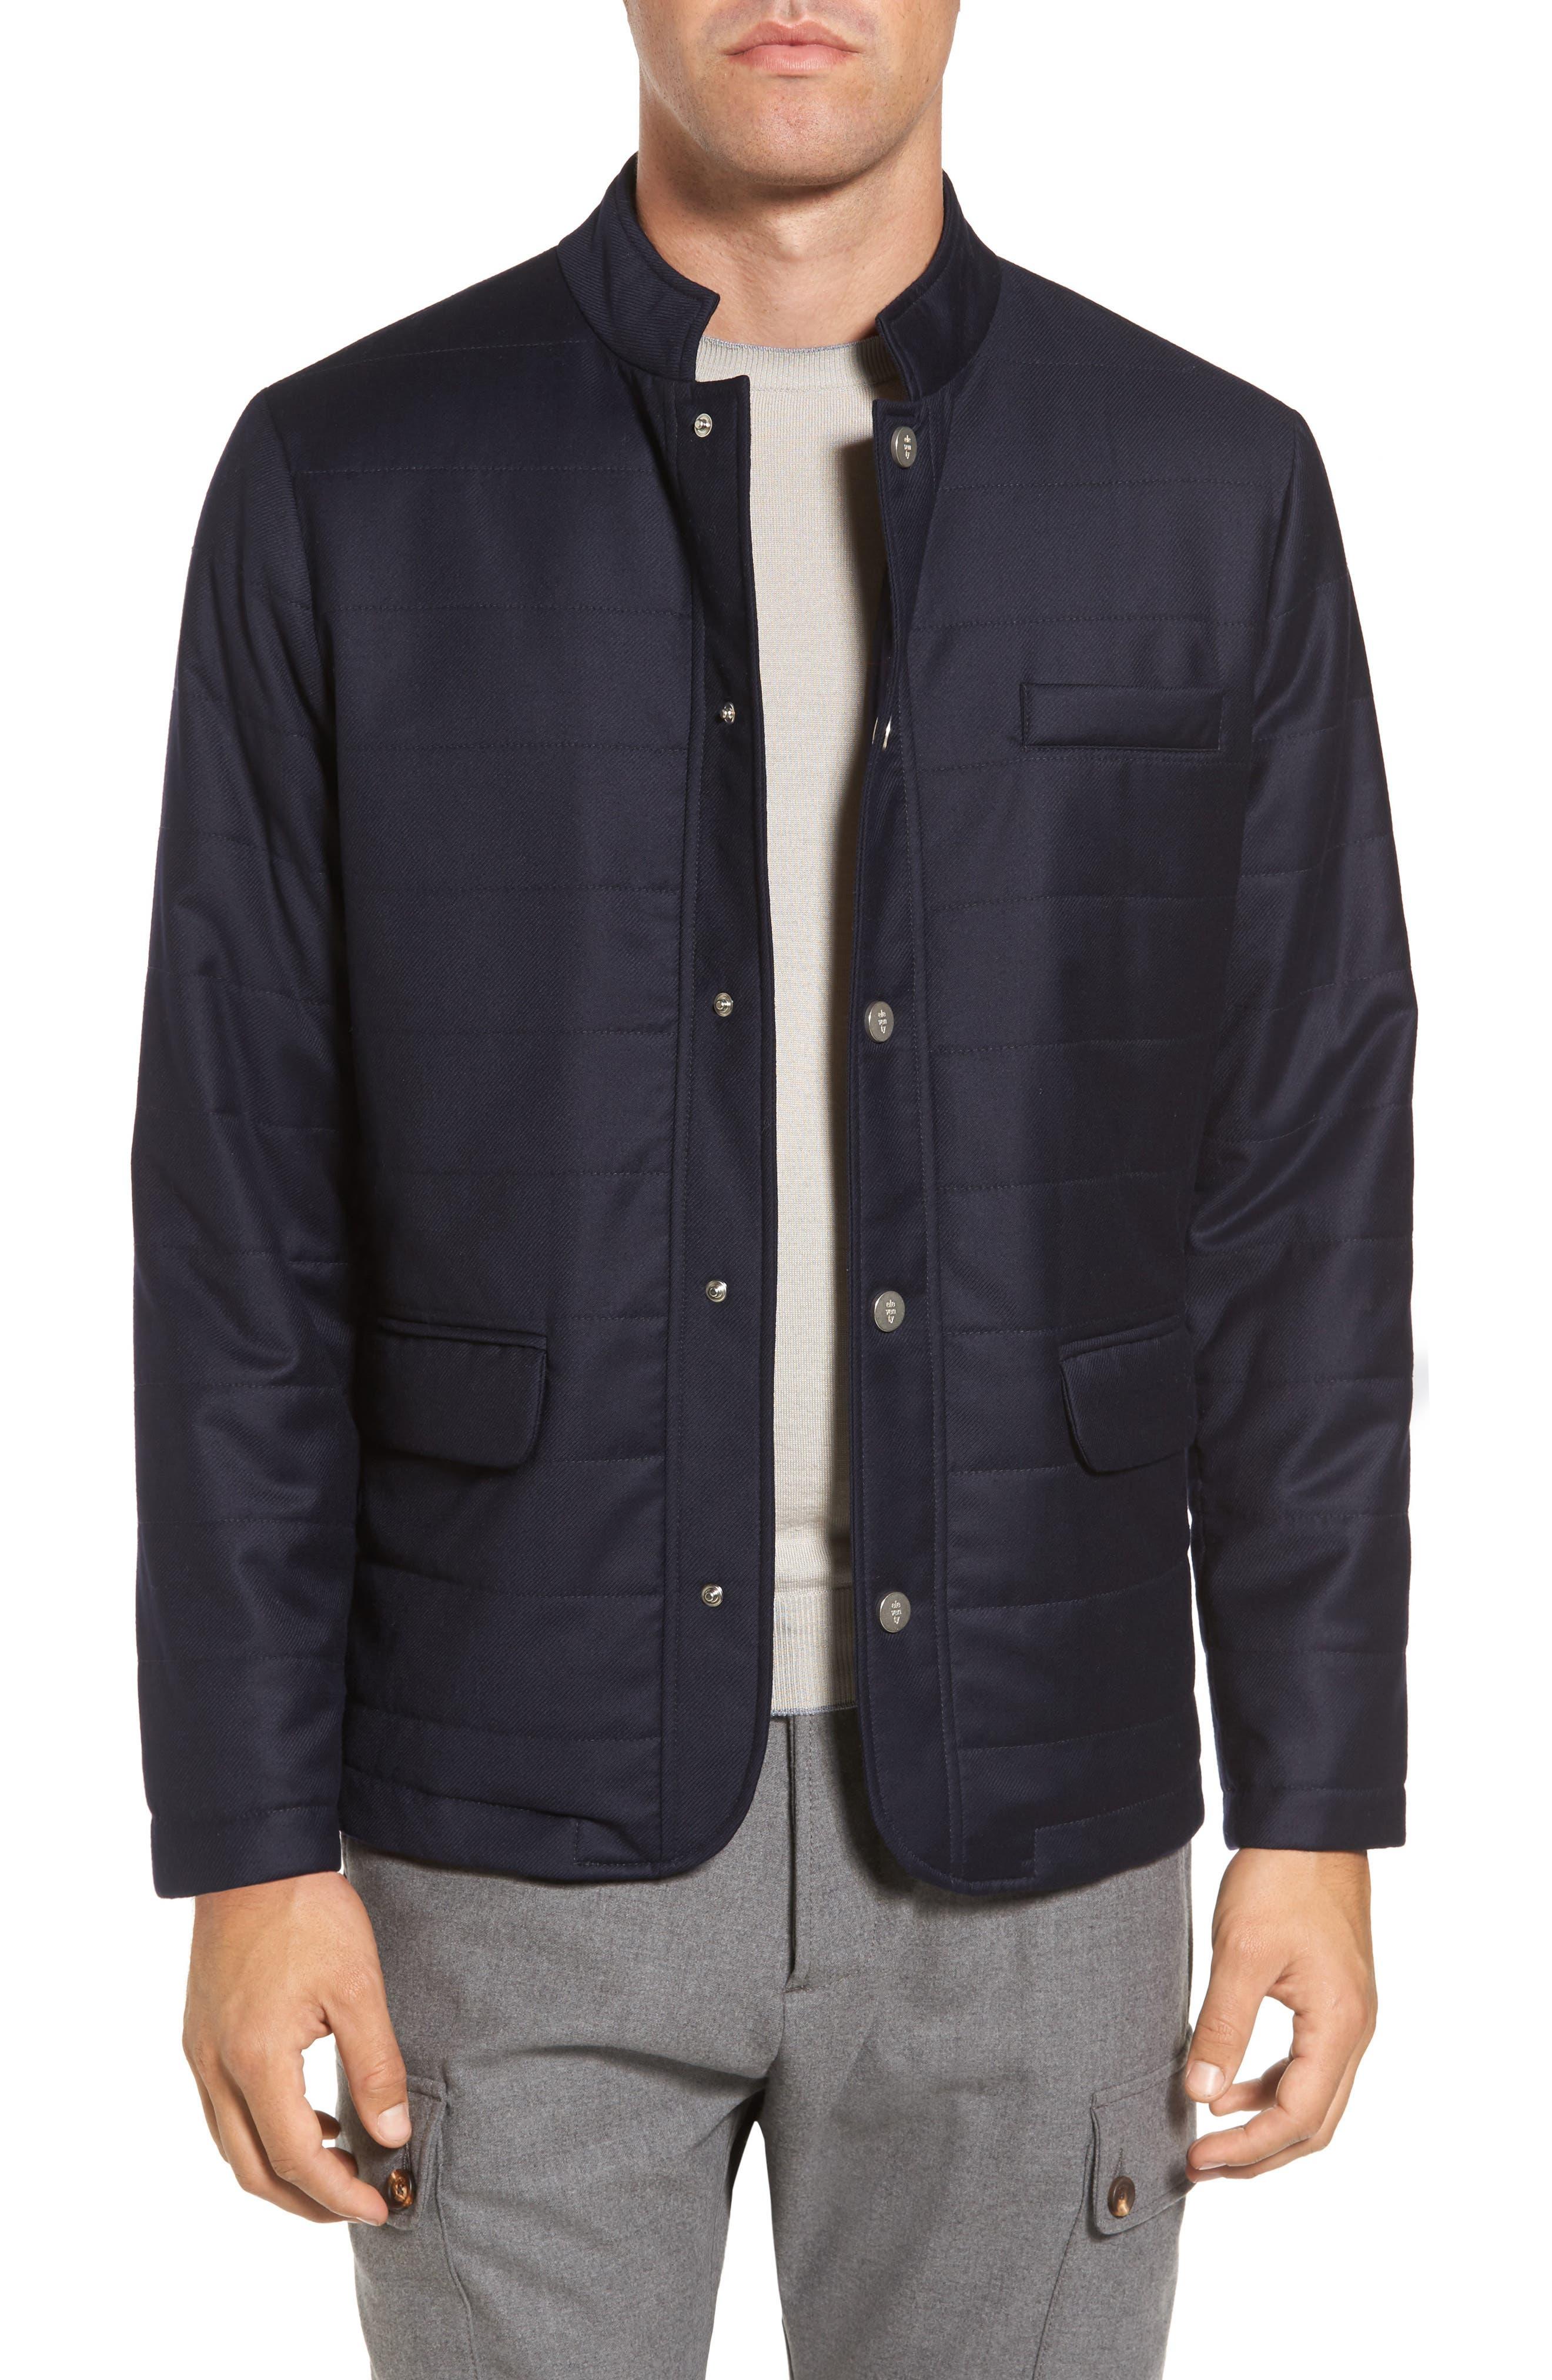 Eleventy Snap Twill Wool Blend Jacket